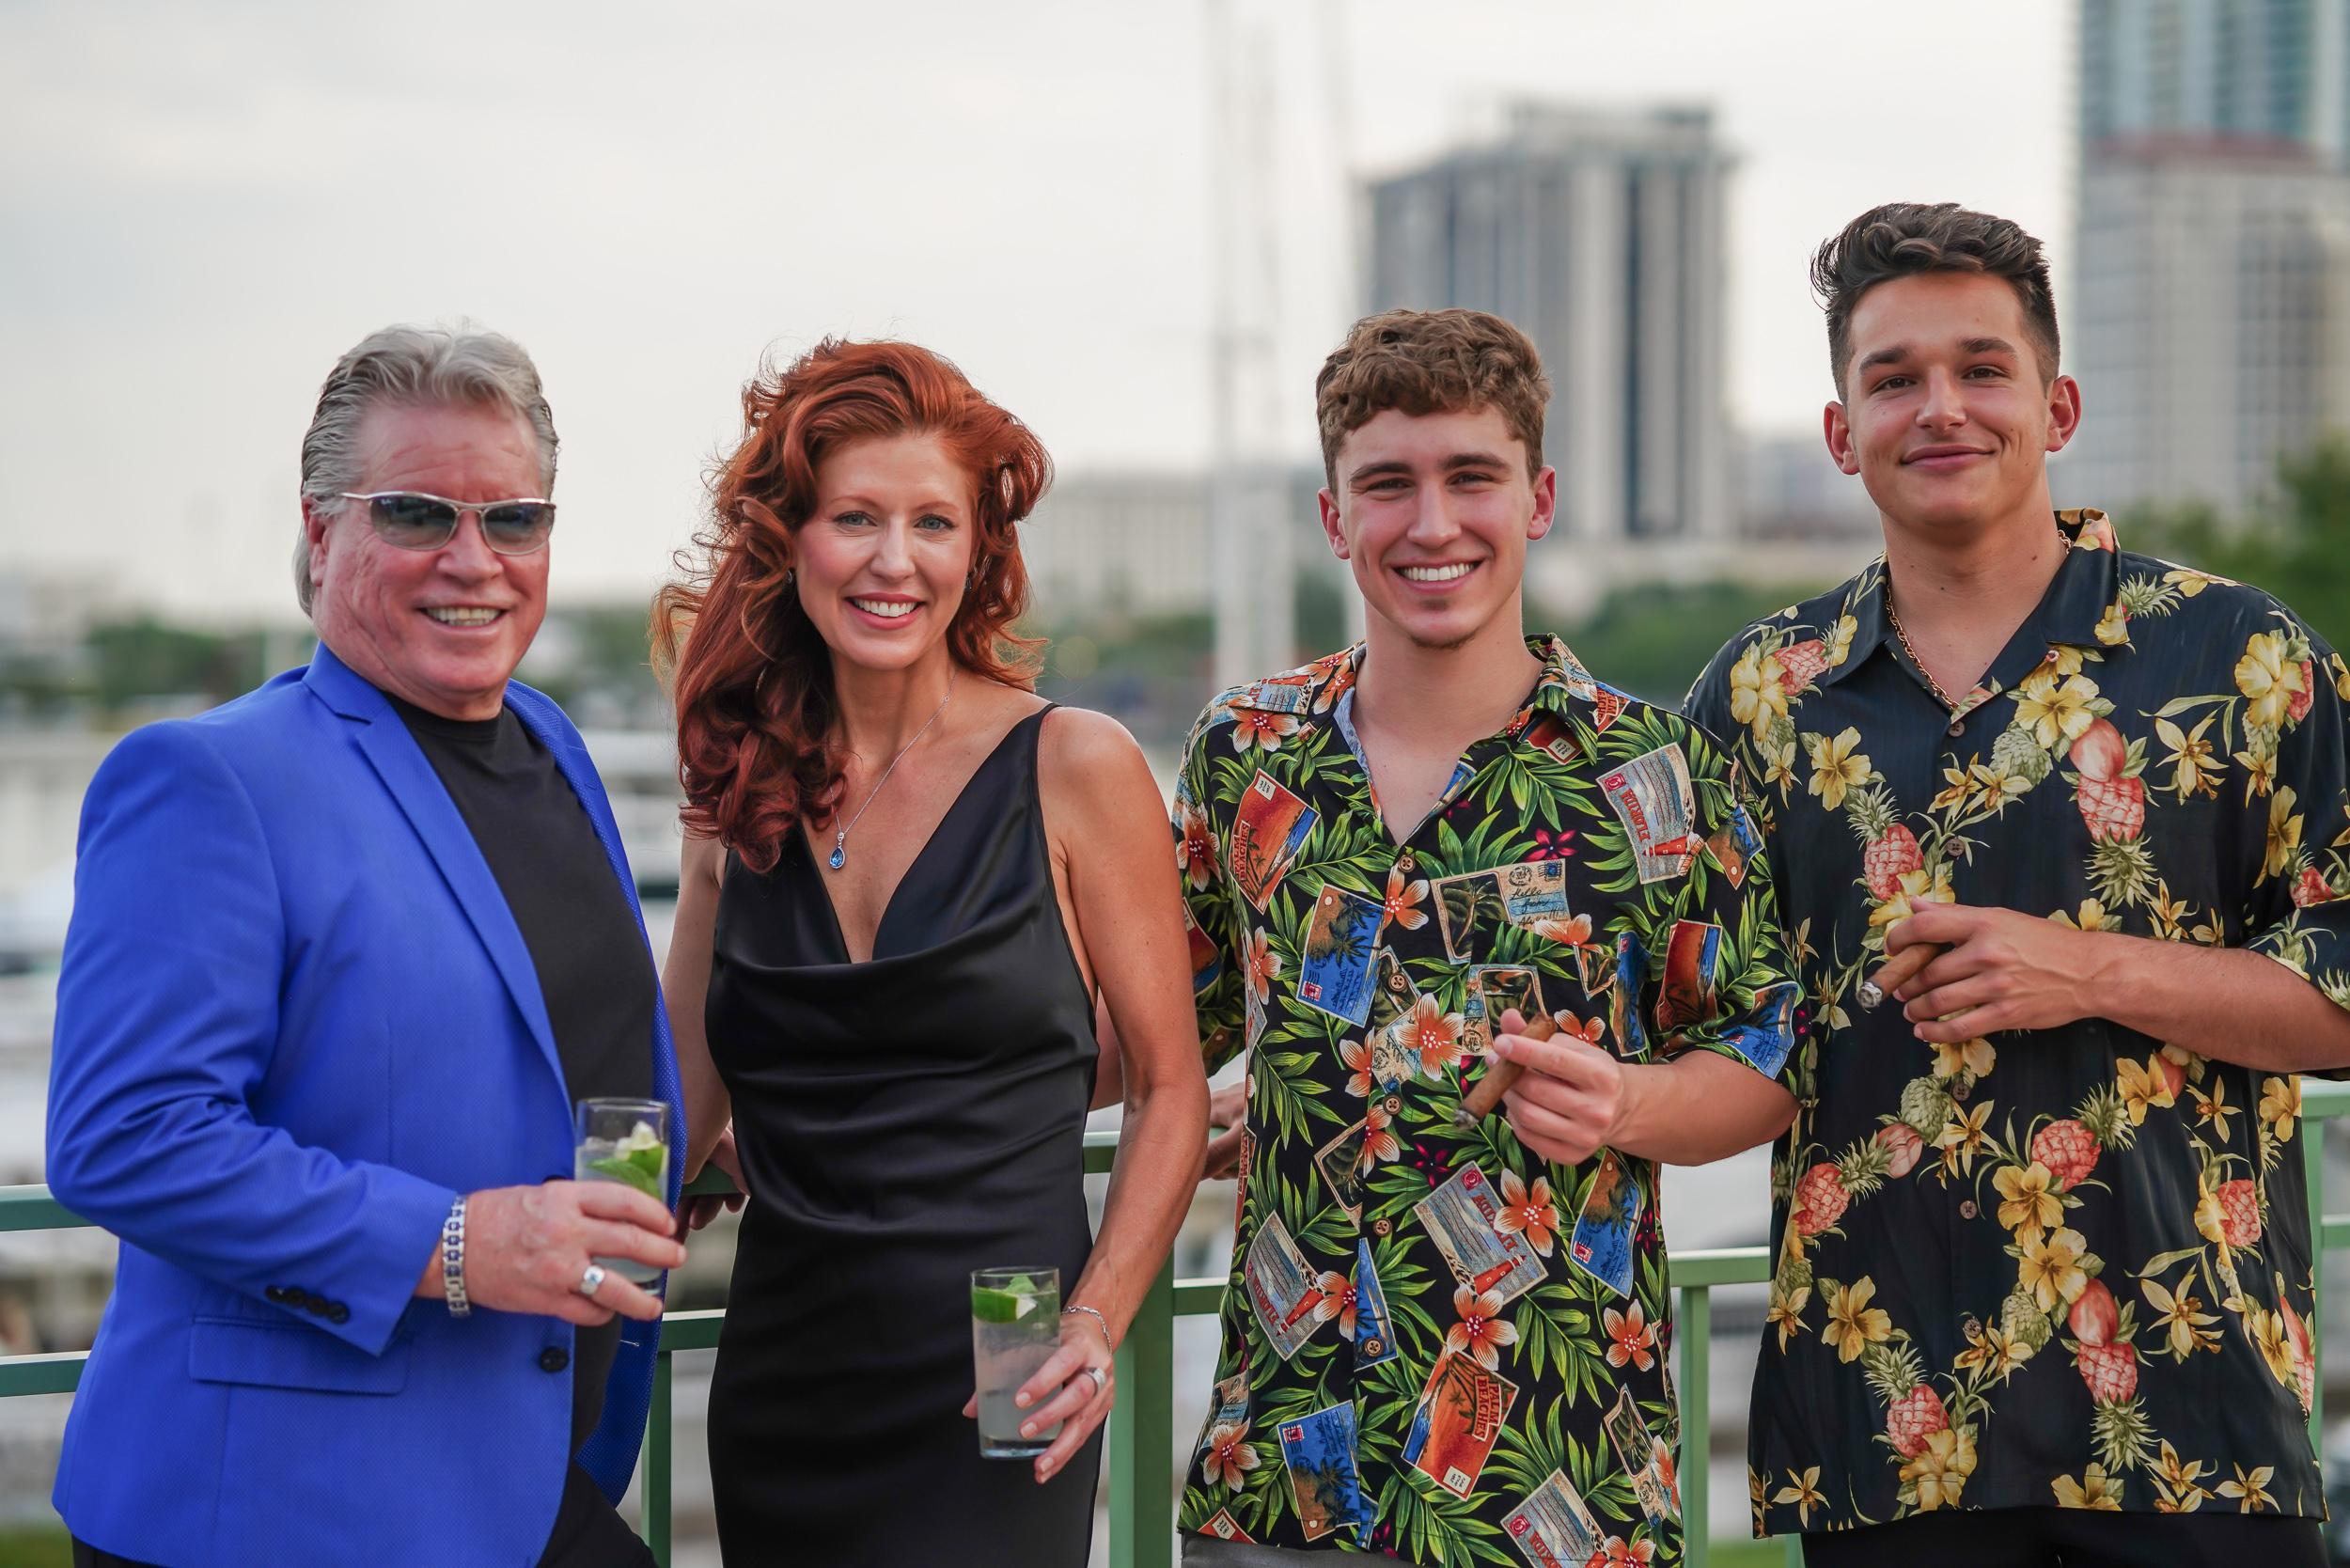 MaintenX International Supports Habitat for Humanity at Havana Nights Gala